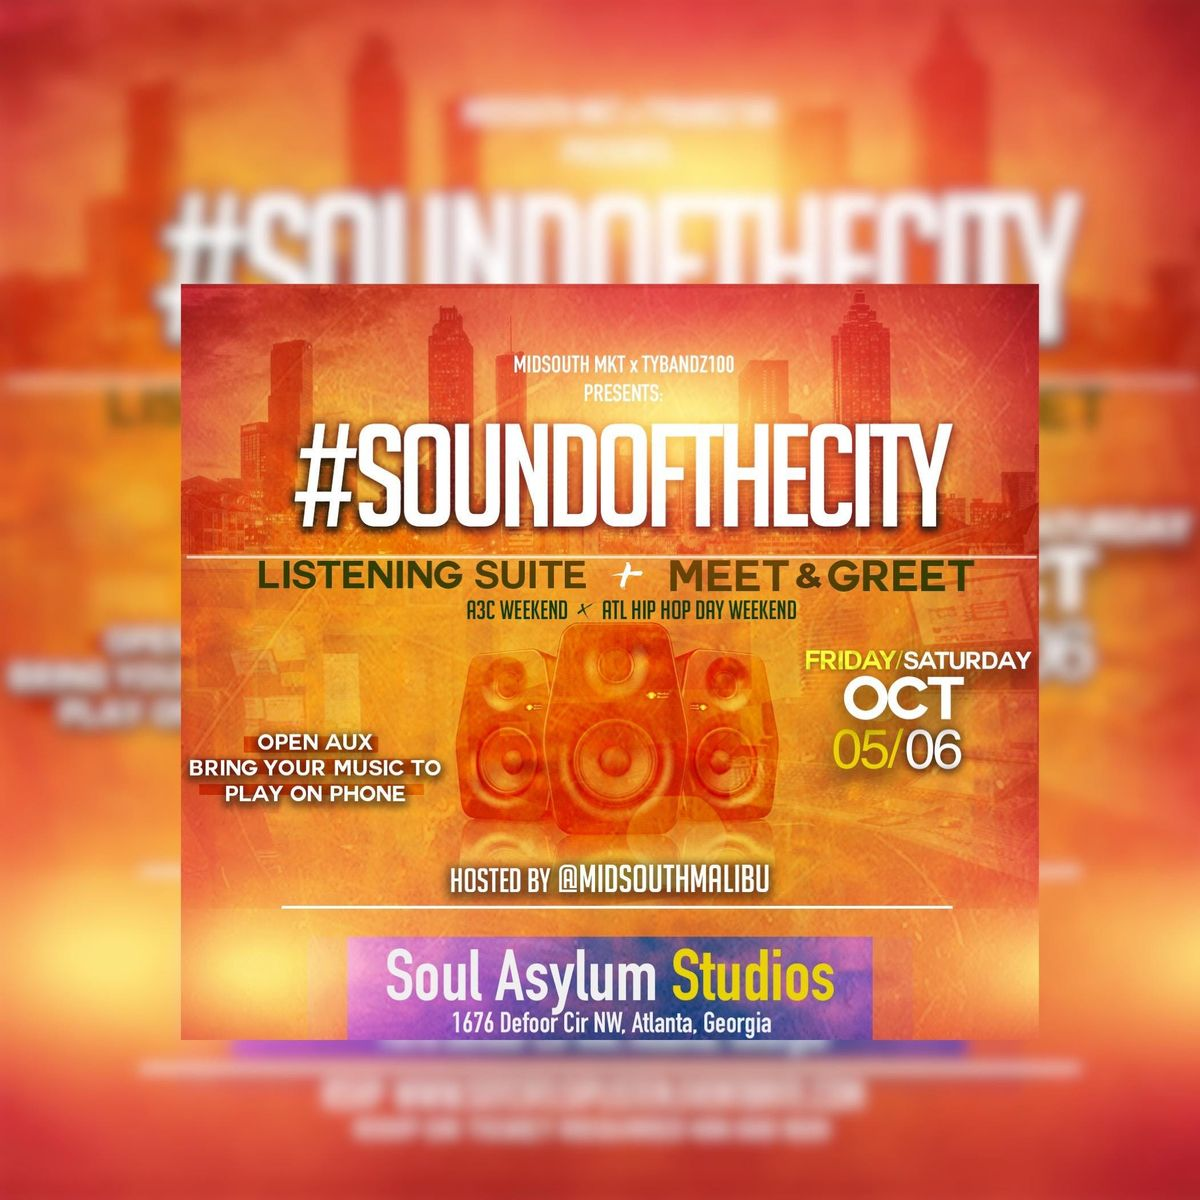 105 SOUND of the CITY (A3C  ATL BET HIP-HOP WKND) SIP -n- LISTEN EVENT 9